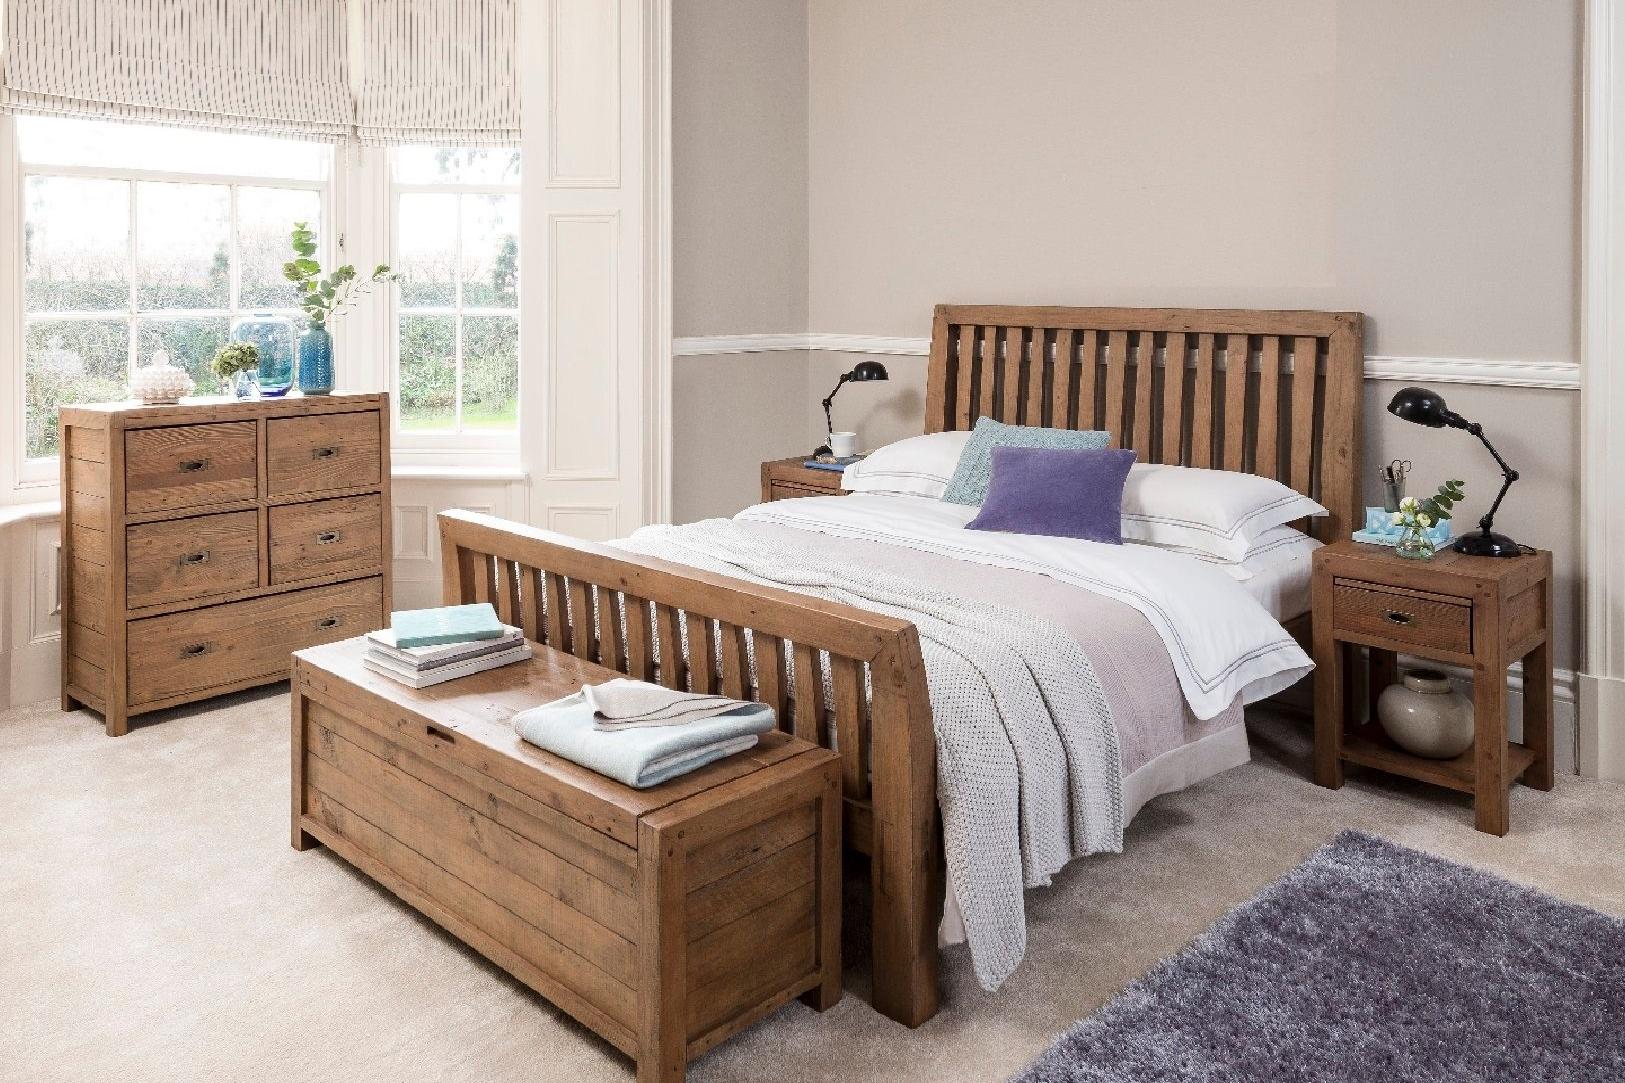 Toscana Bedroom Reclaimed Wood